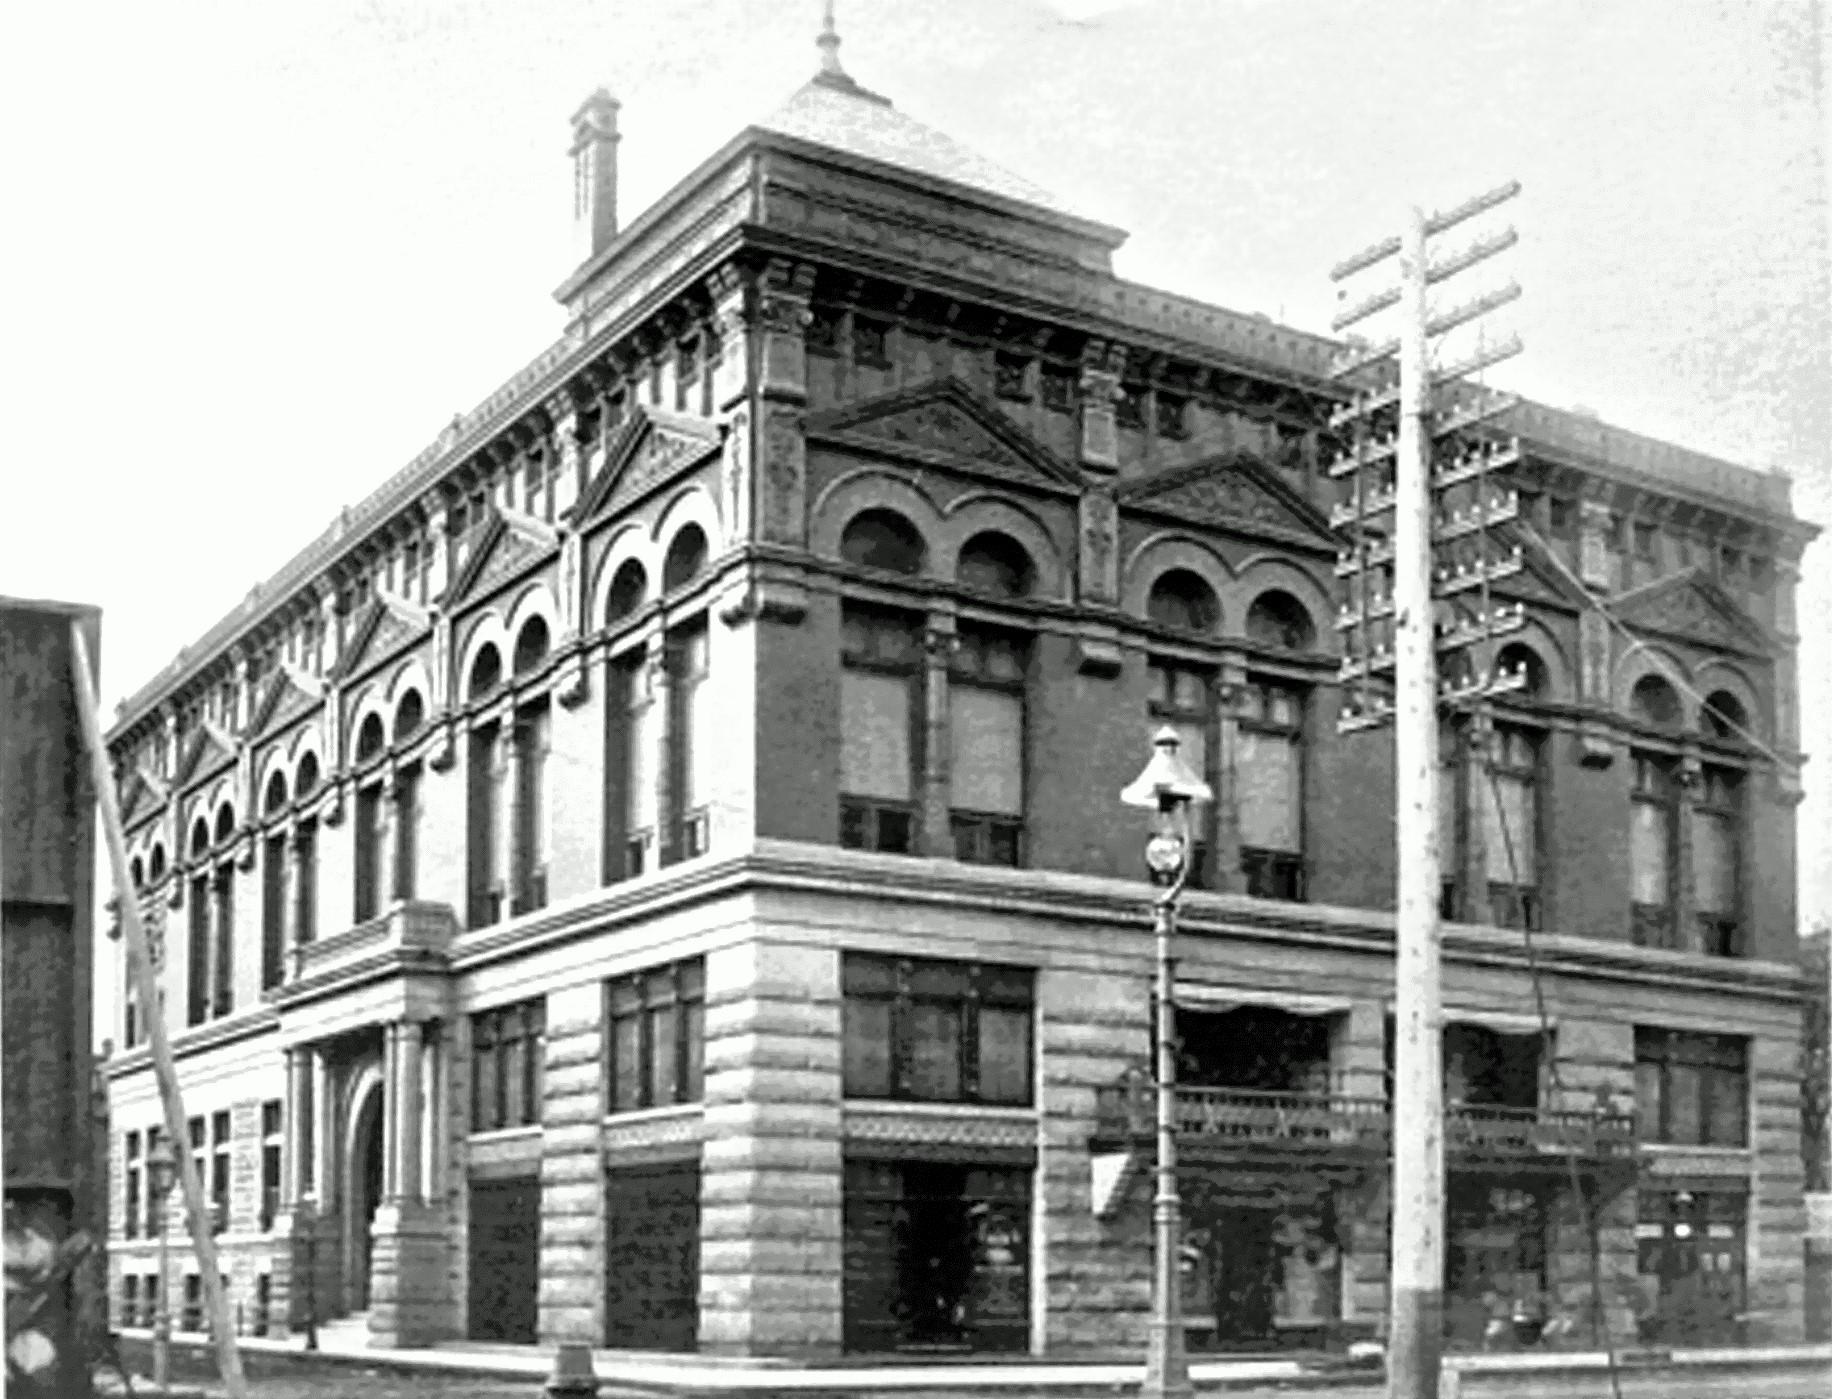 File:Germania Club, August Fiedler arch.jpg - Wikimedia Commons